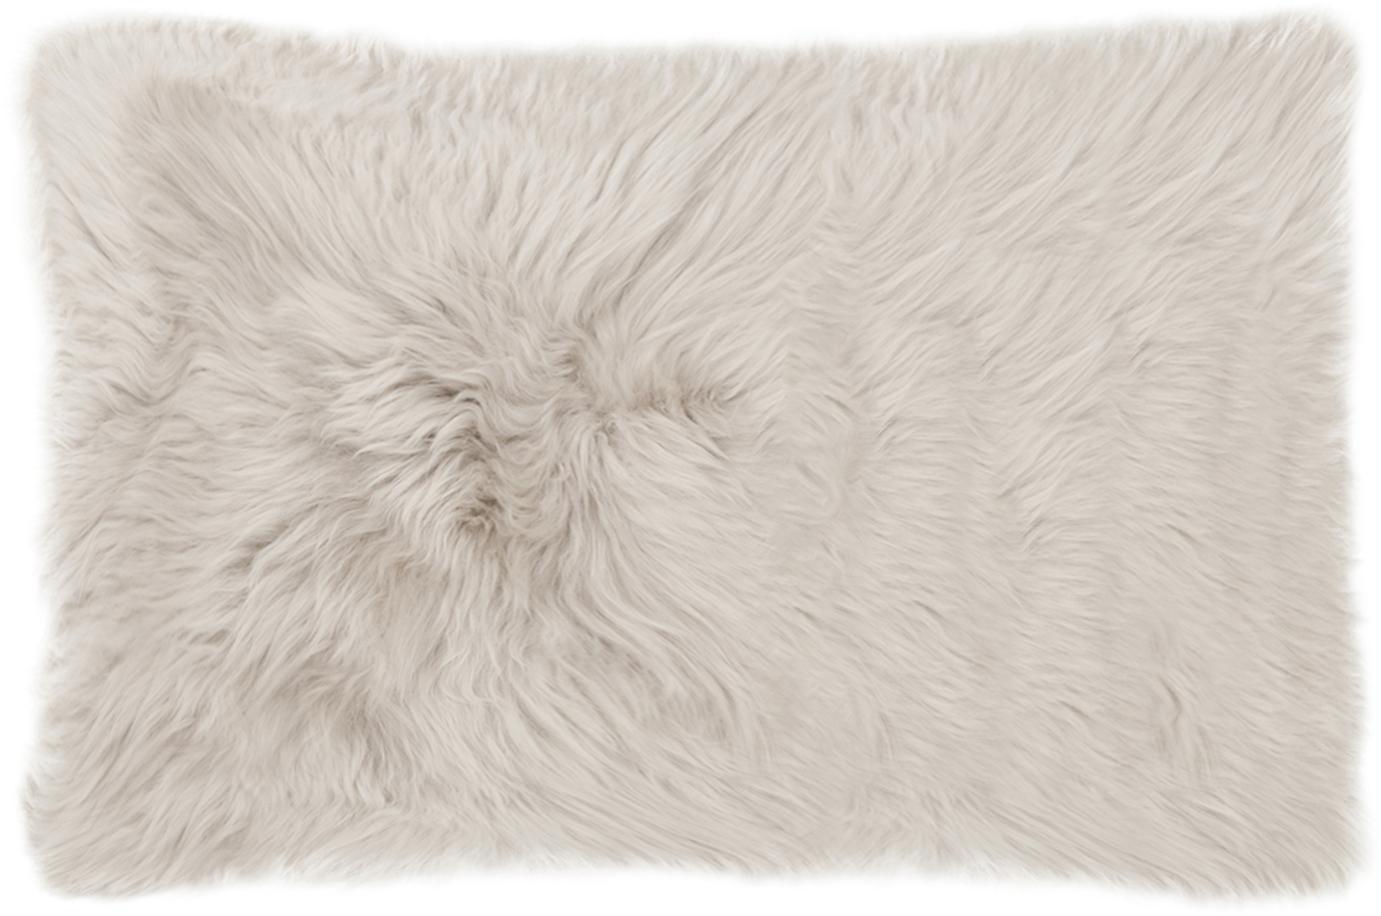 Funda de cojín de piel de oveja Oslo, Parte delantera: piel de oveja, Parte trasera: lino, Beige, gris claro, An 30 x L 50 cm